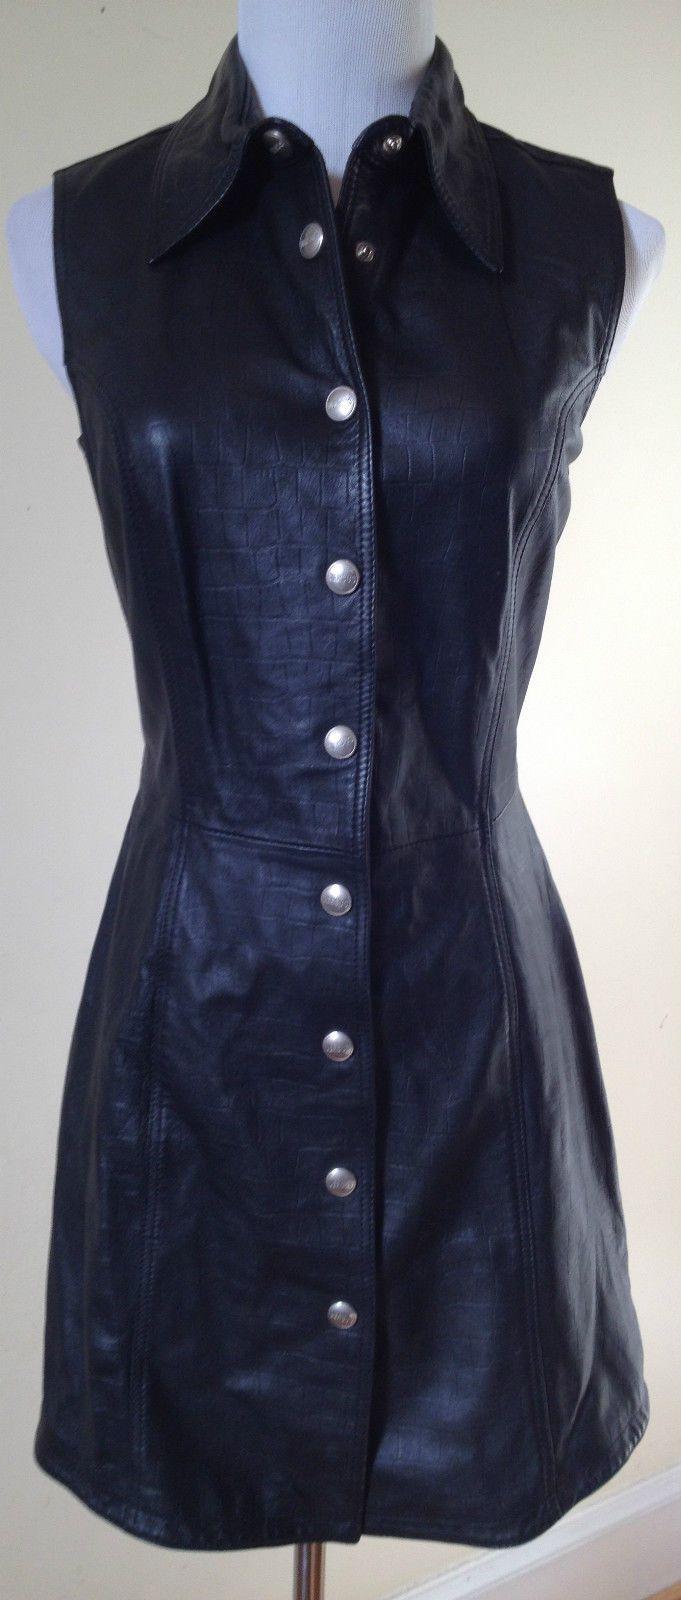 Gianni Versace Versus Ittierre Black Leather 90s Snap Front Dress 28 42 S |  eBay